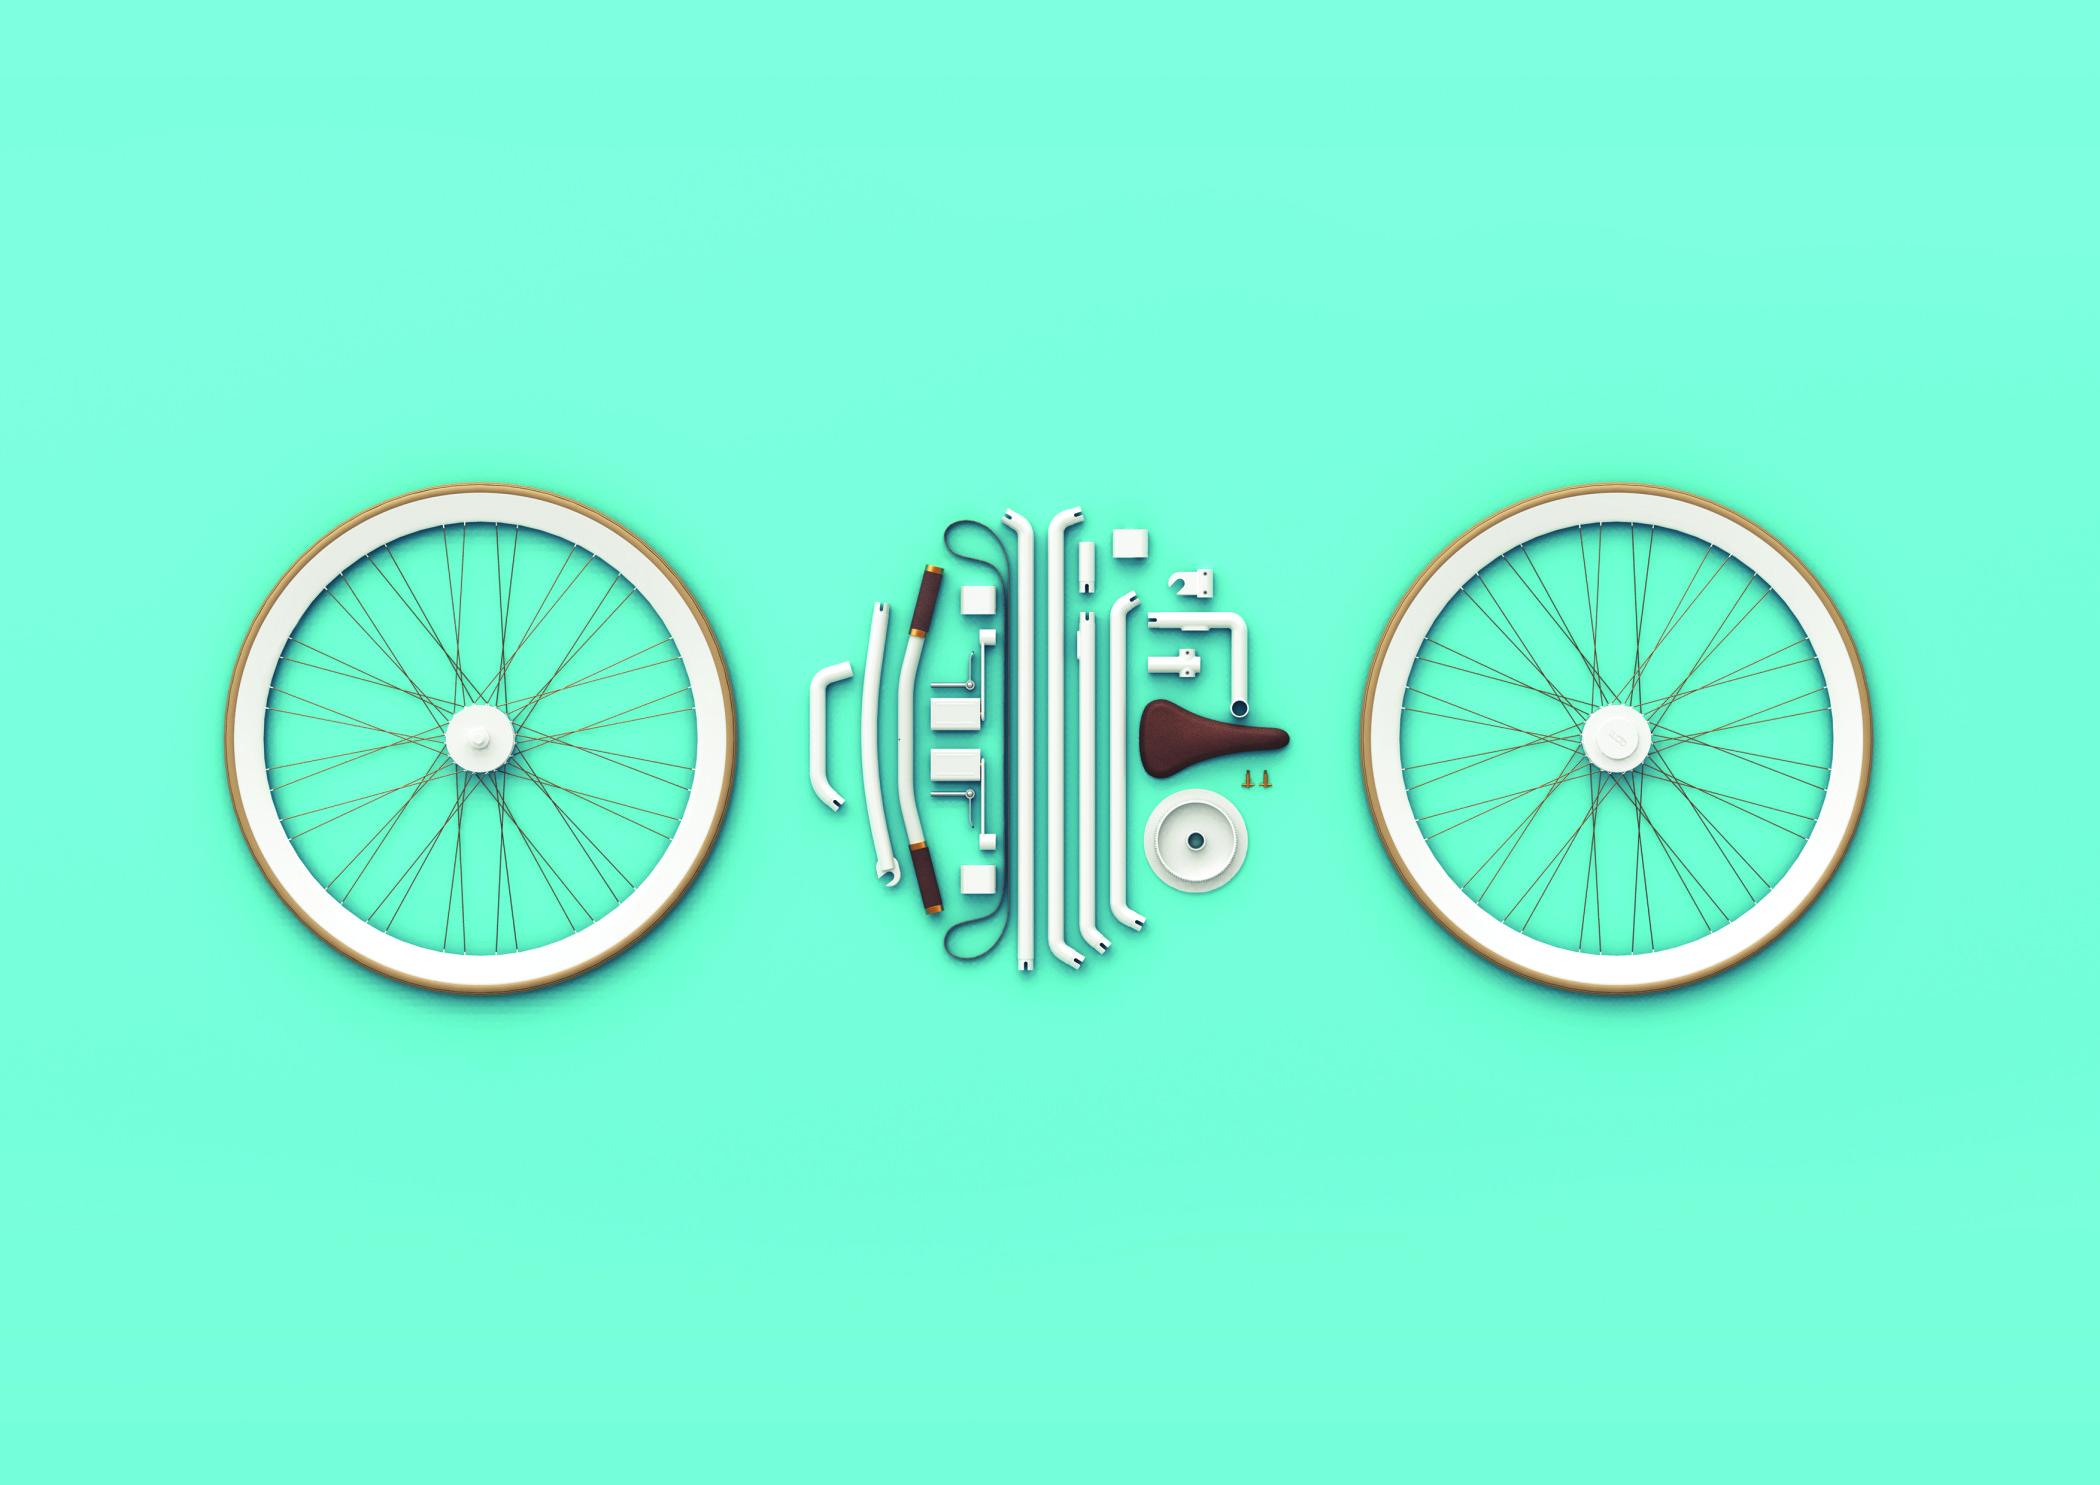 kit-bike_design_002